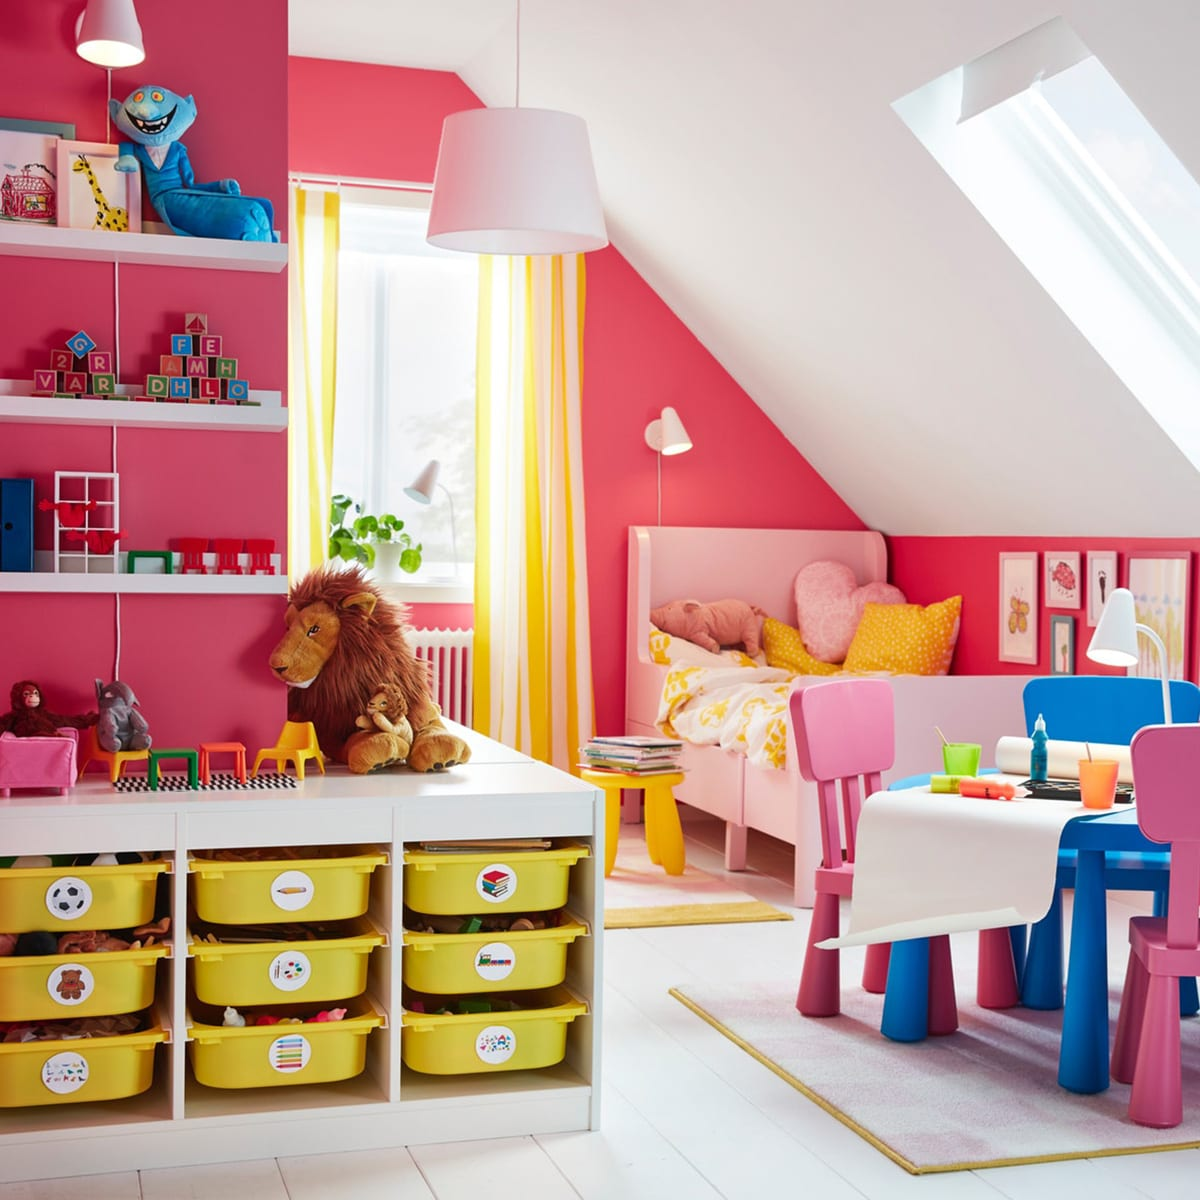 Mensole Ikea Cucina Prezzi children's room gallery - ikea switzerland